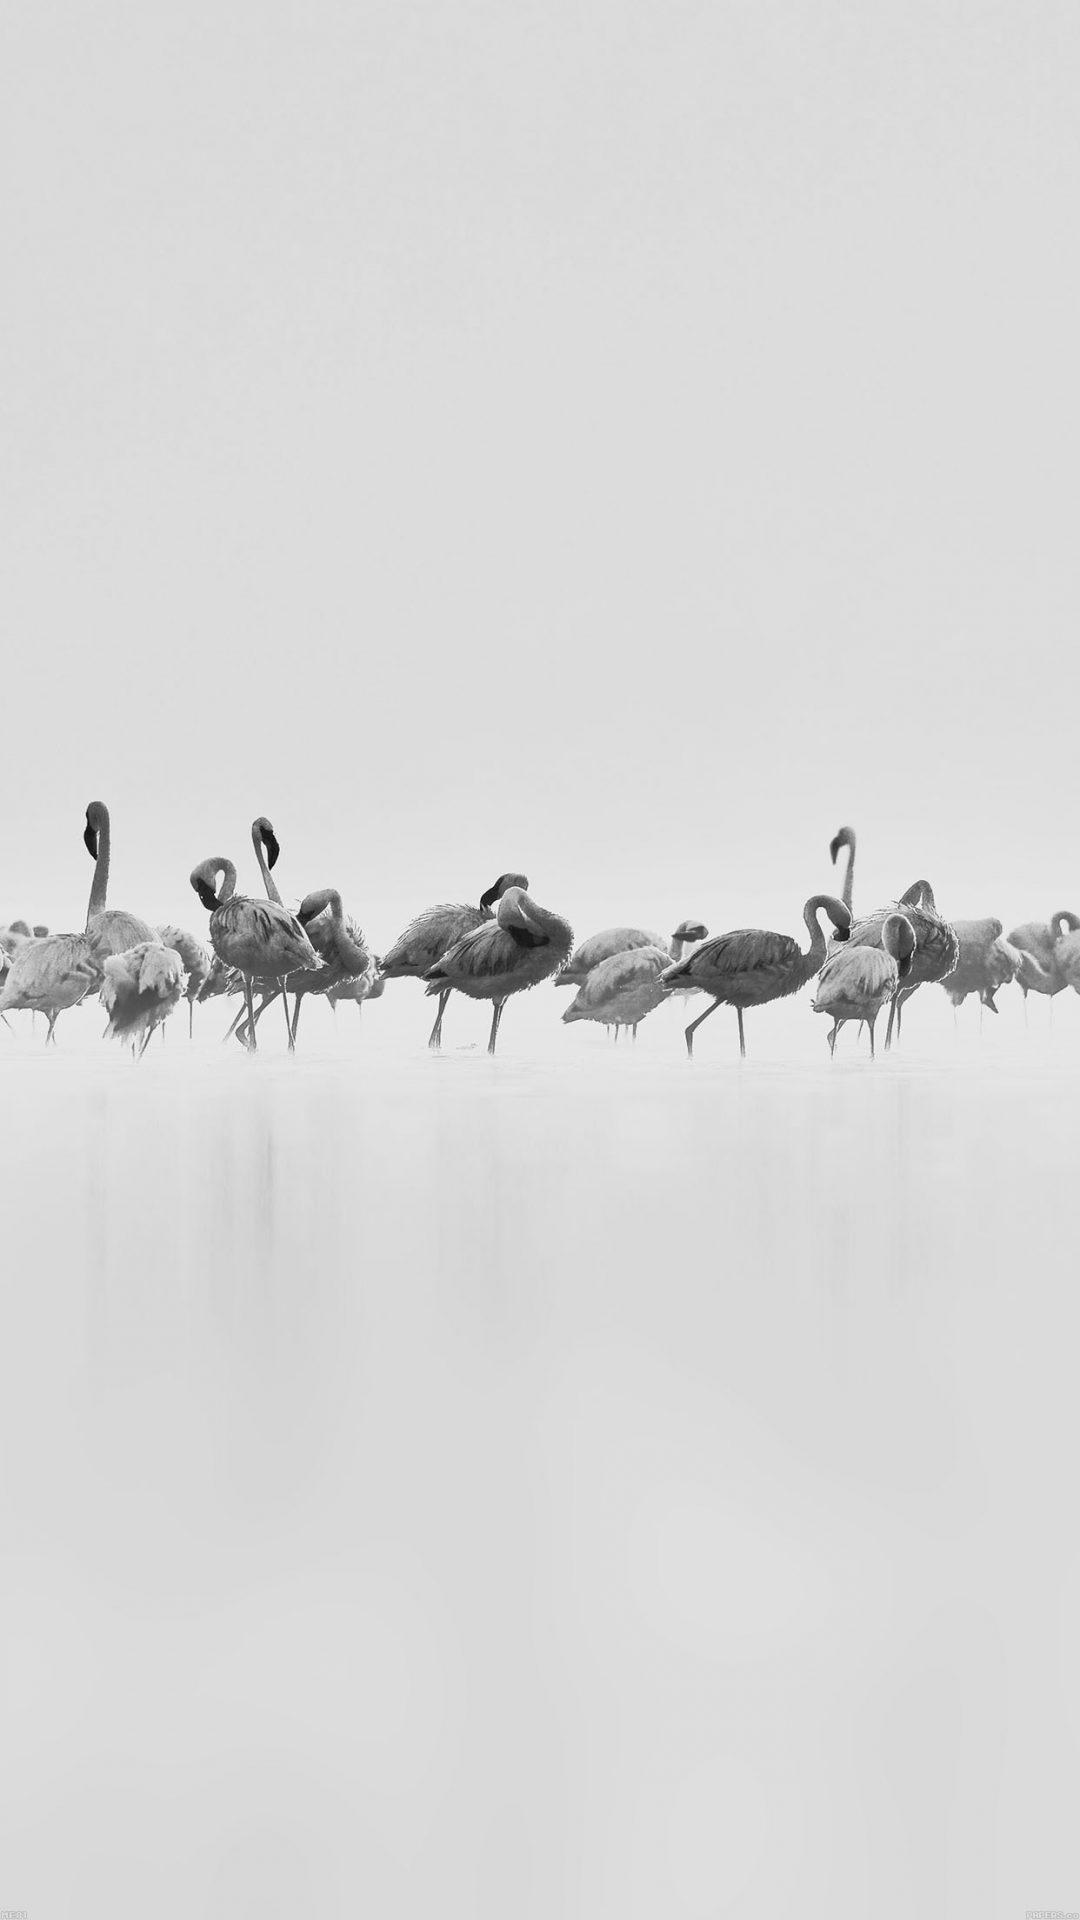 Flamingos White Peace Animal Nature Birds